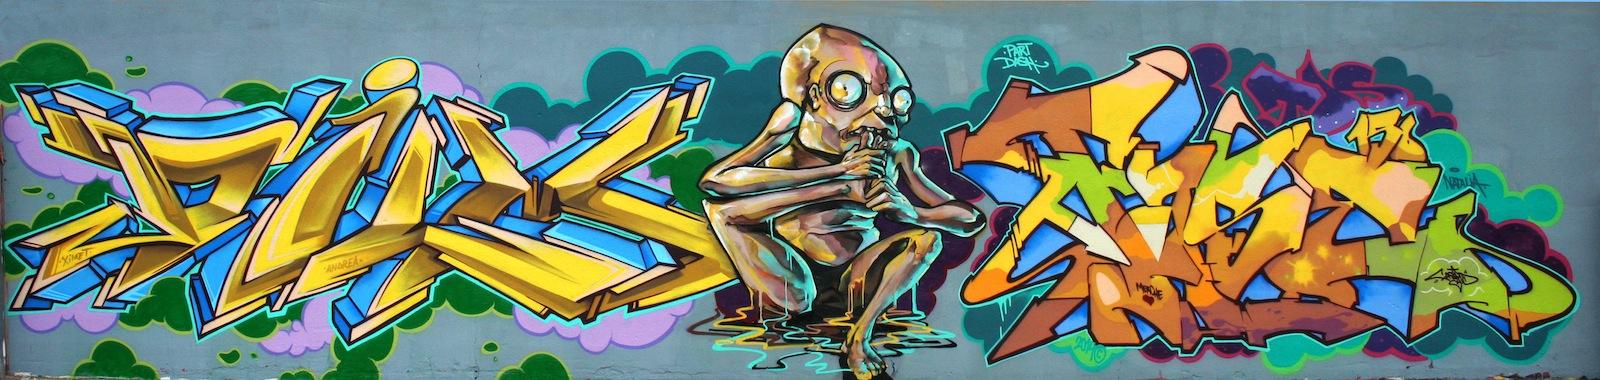 Dilm-Derk-Fasim-Abril-14-Valencia-Graffiti